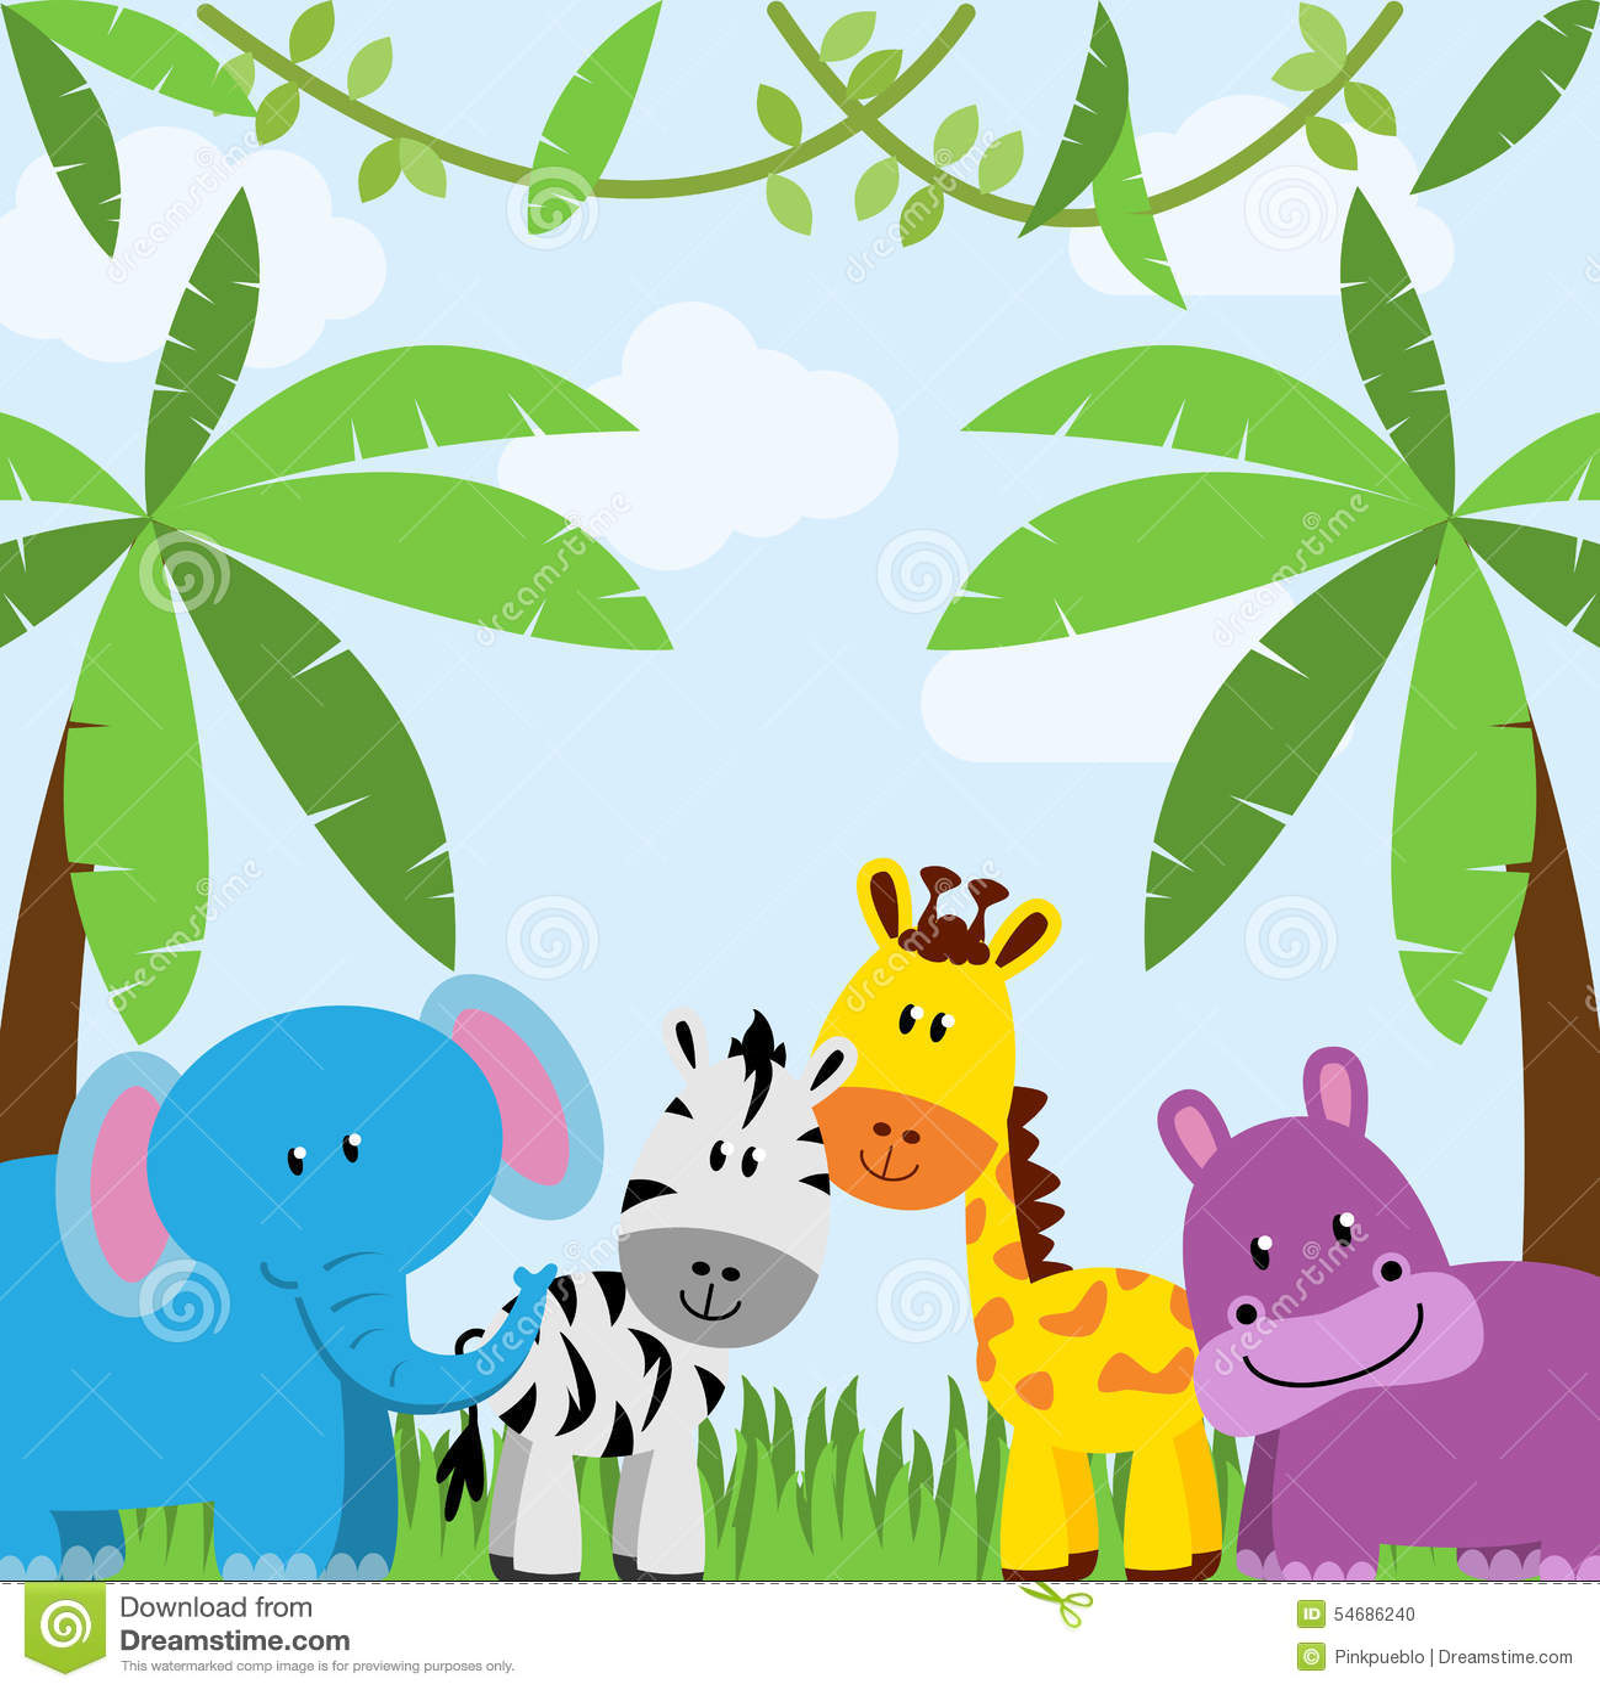 Jungle Or Zoo Themed Animal Background Stock Illustration - Image ...